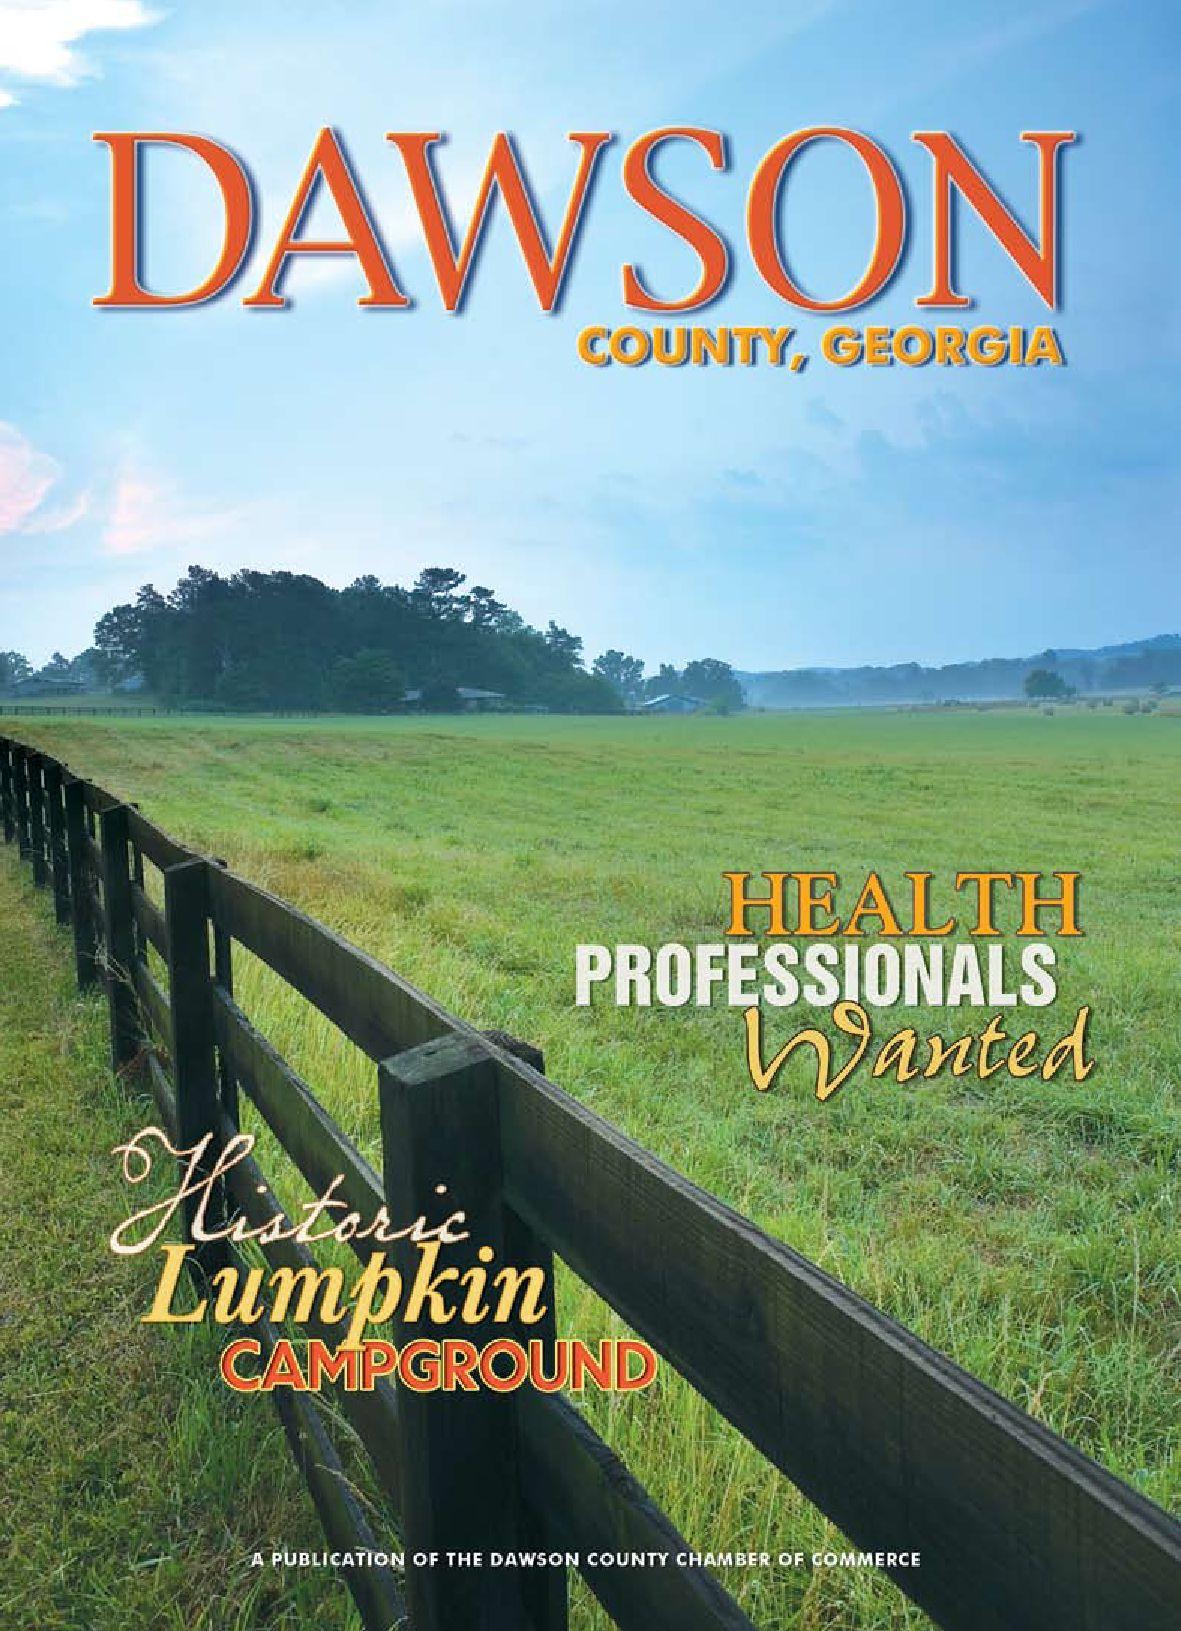 Dawson County Georgia by Dawson County Chamber of merce and CVB